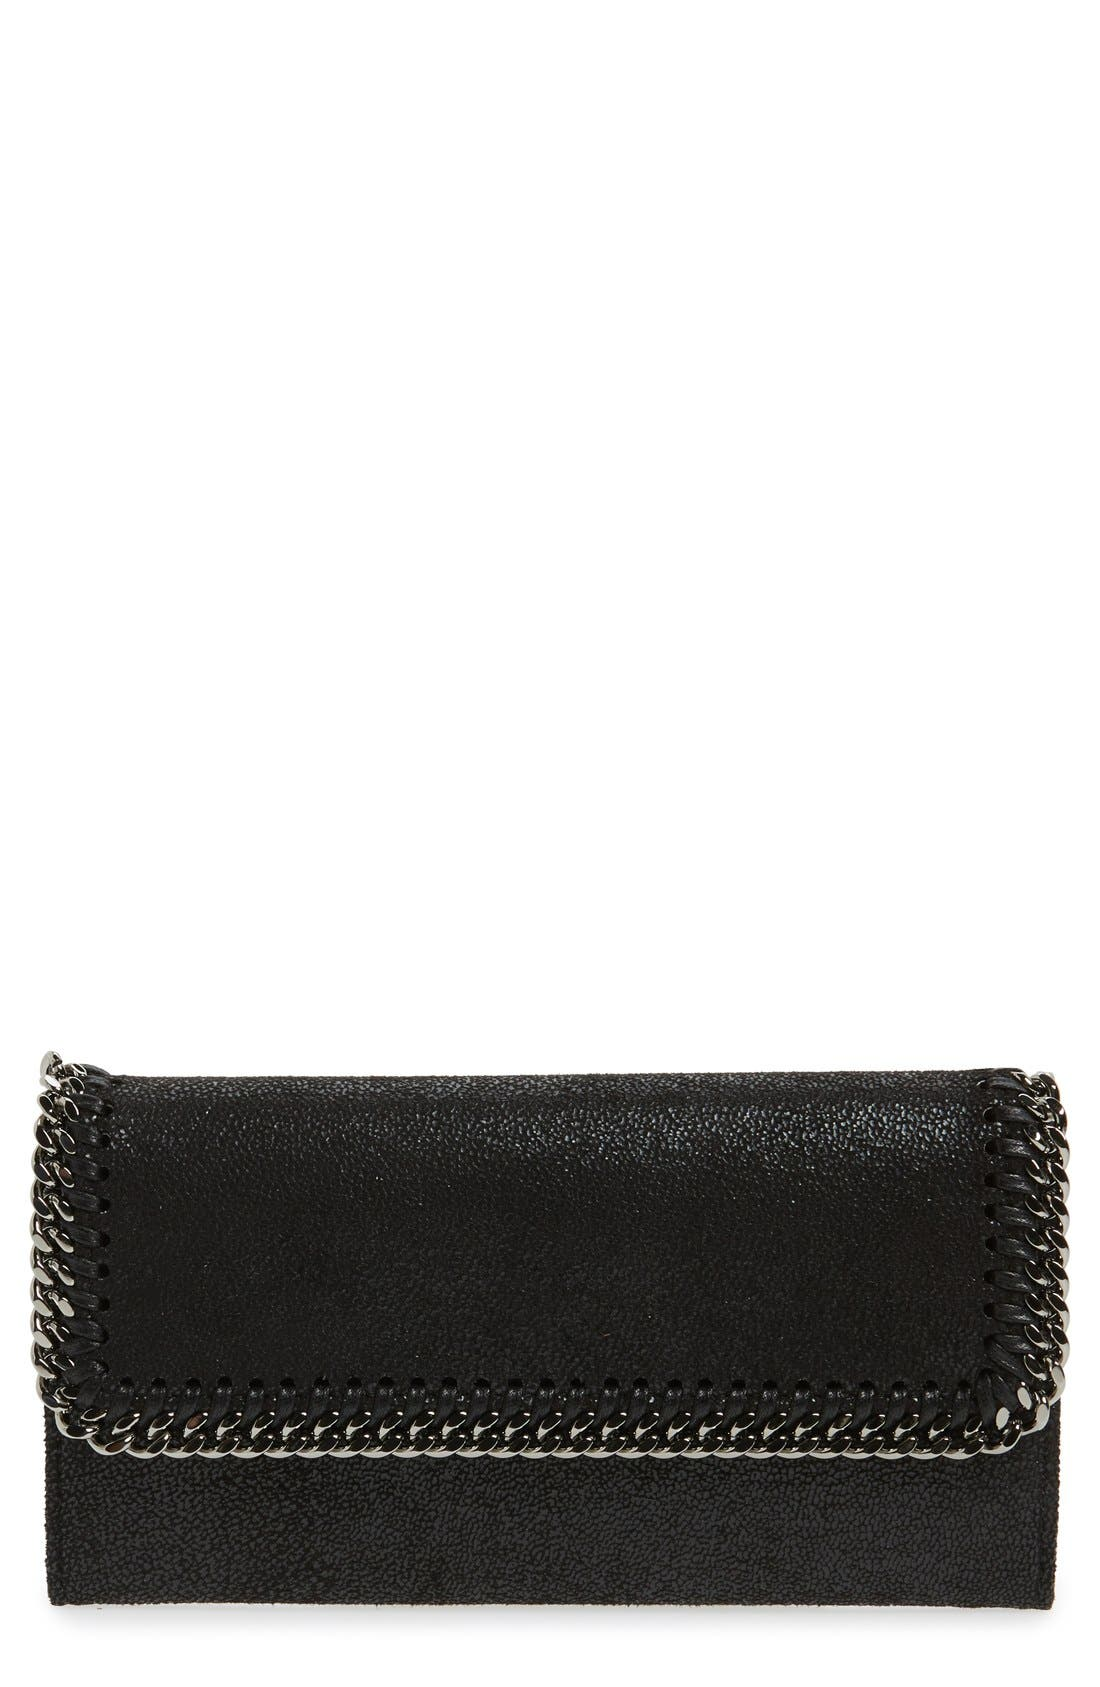 'Falabella - Rainbow POP' Faux Leather Continental Wallet,                             Main thumbnail 1, color,                             BLACK